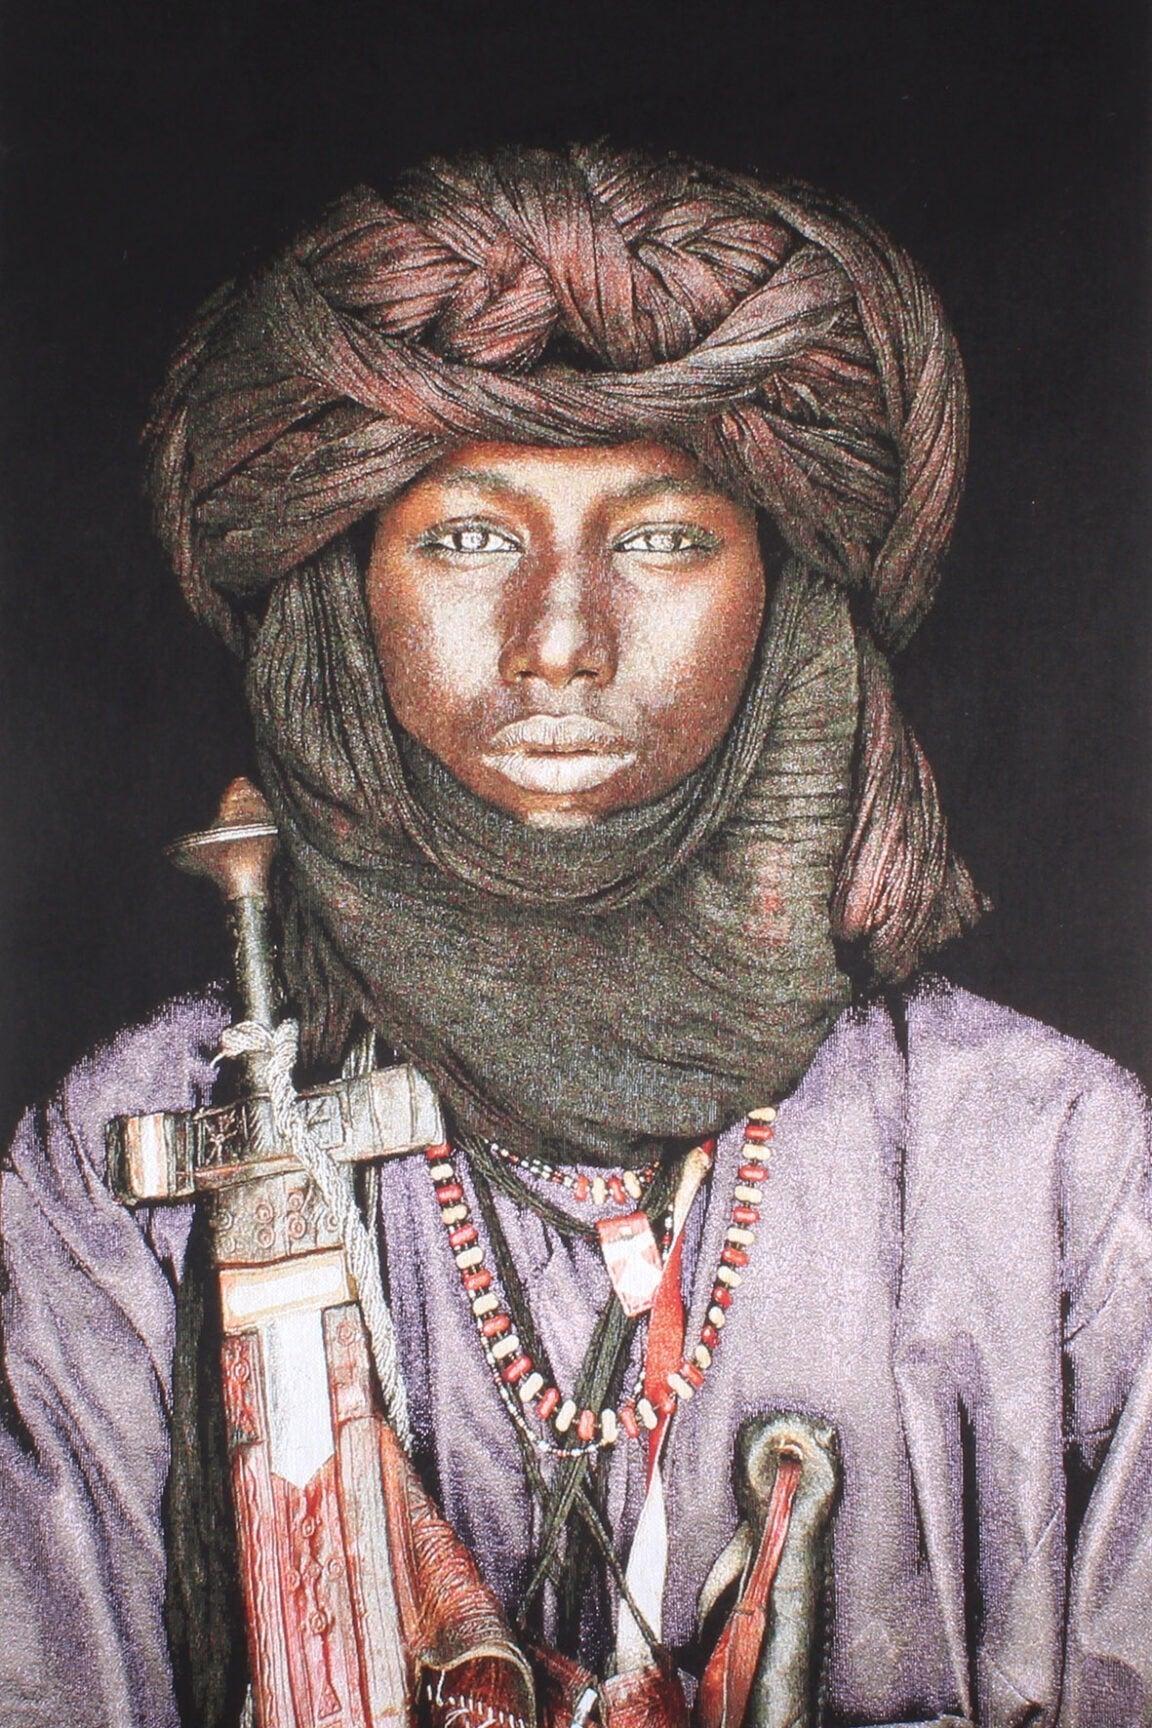 Gobelinbild-Dawo-Fulani-Tribe